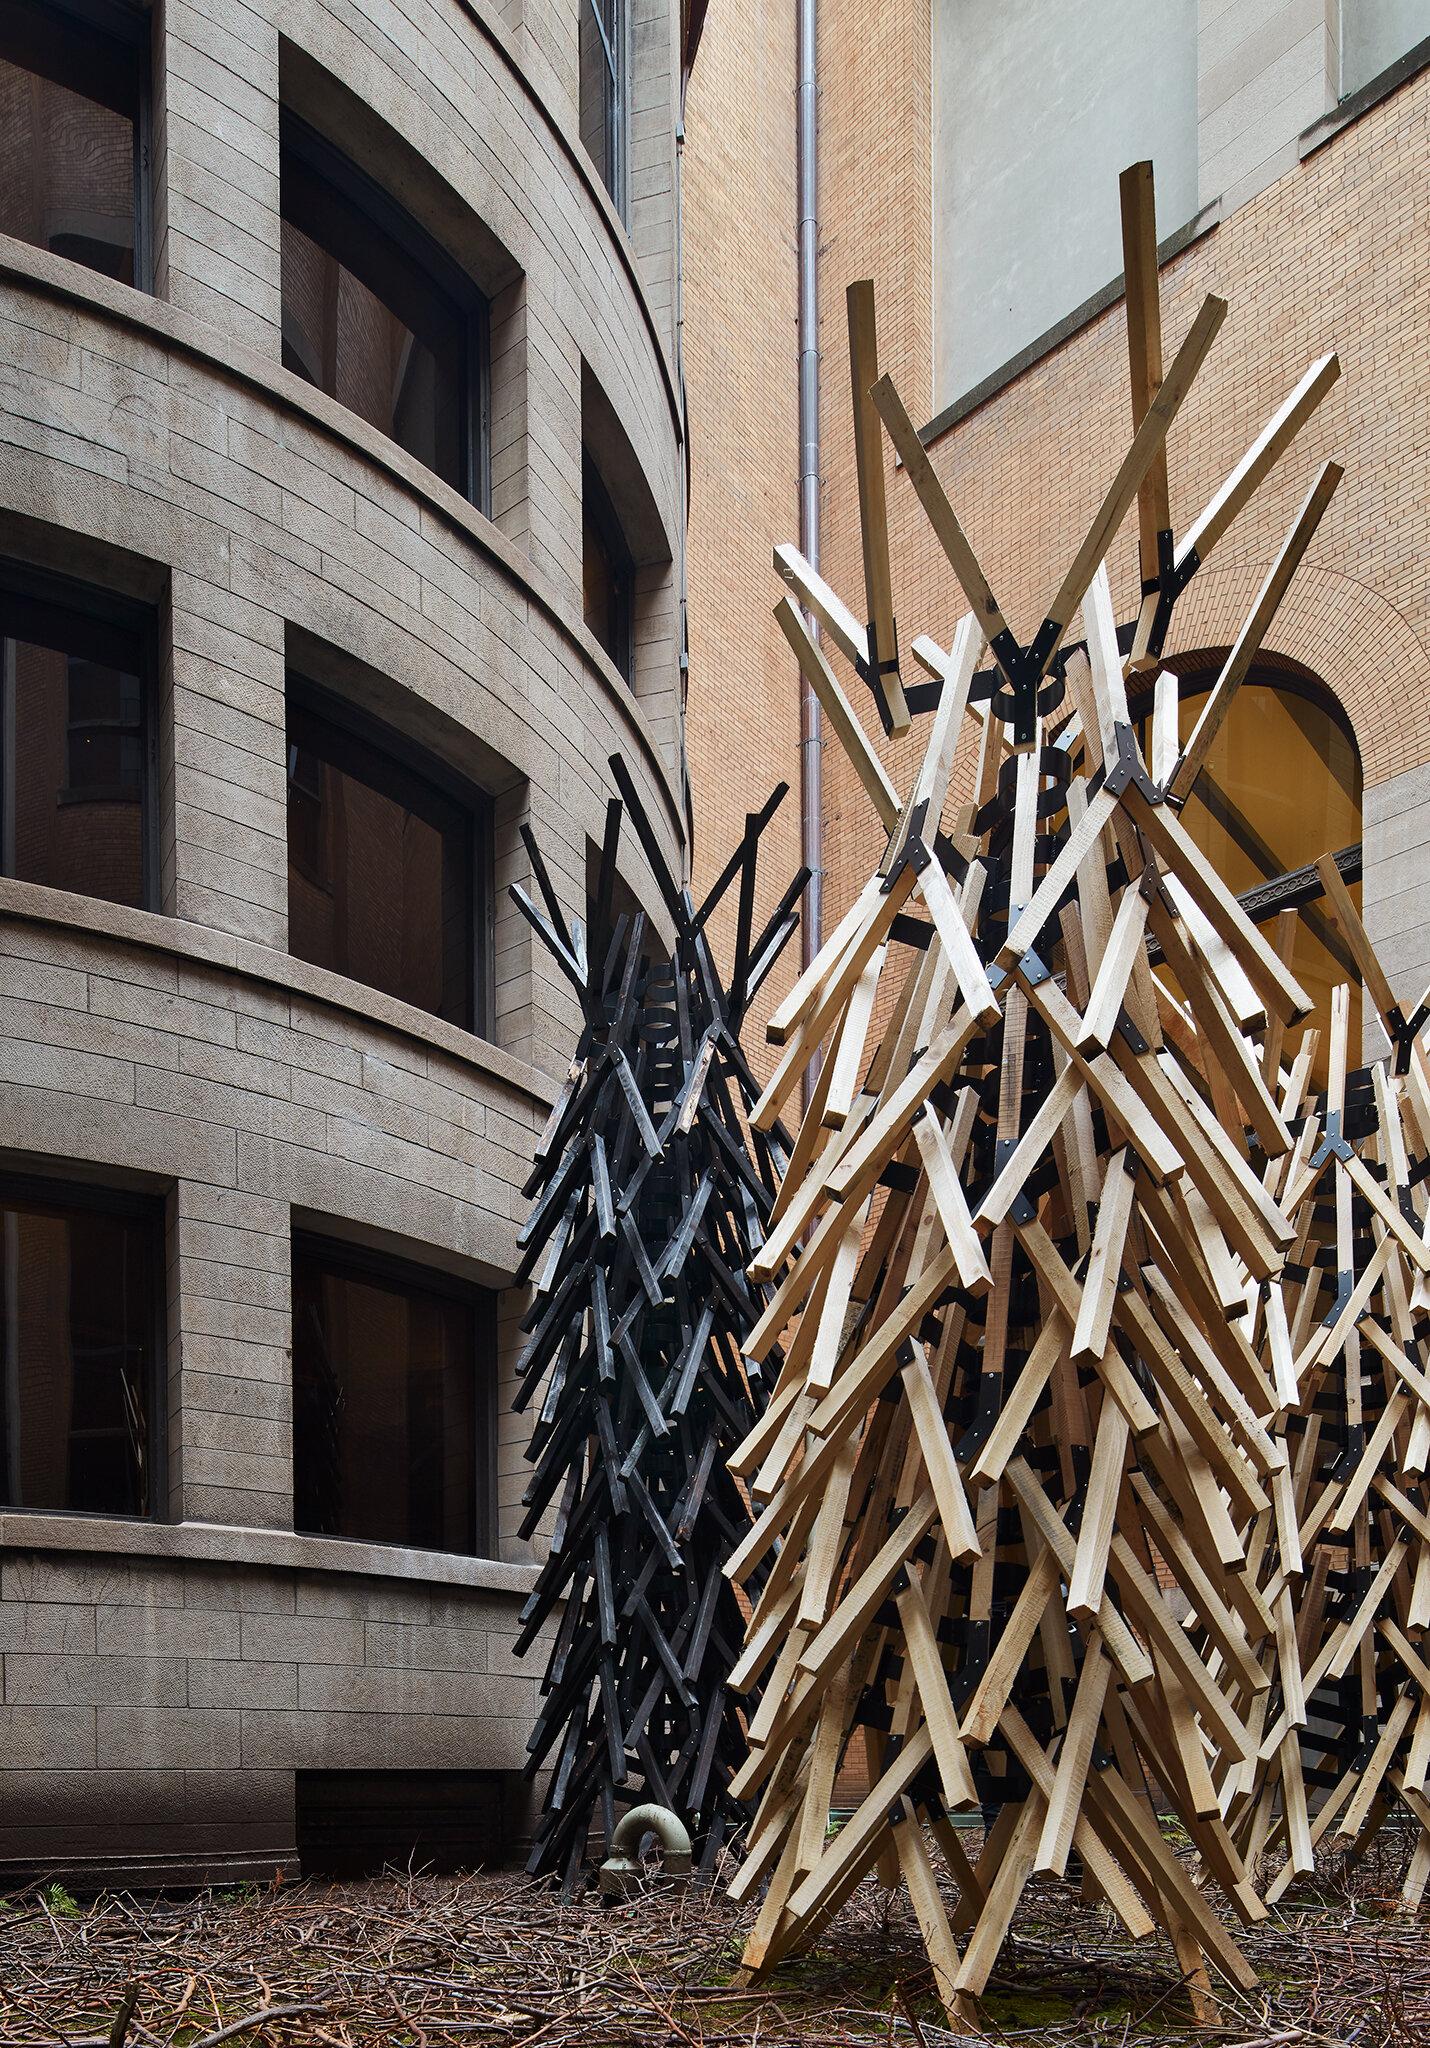 THREE TREES: Jackson, Obama, Washington, 2019. Walter J. Hood. Photo courtesy of Chicago Architecture Biennial / Kendall McCaugherty,